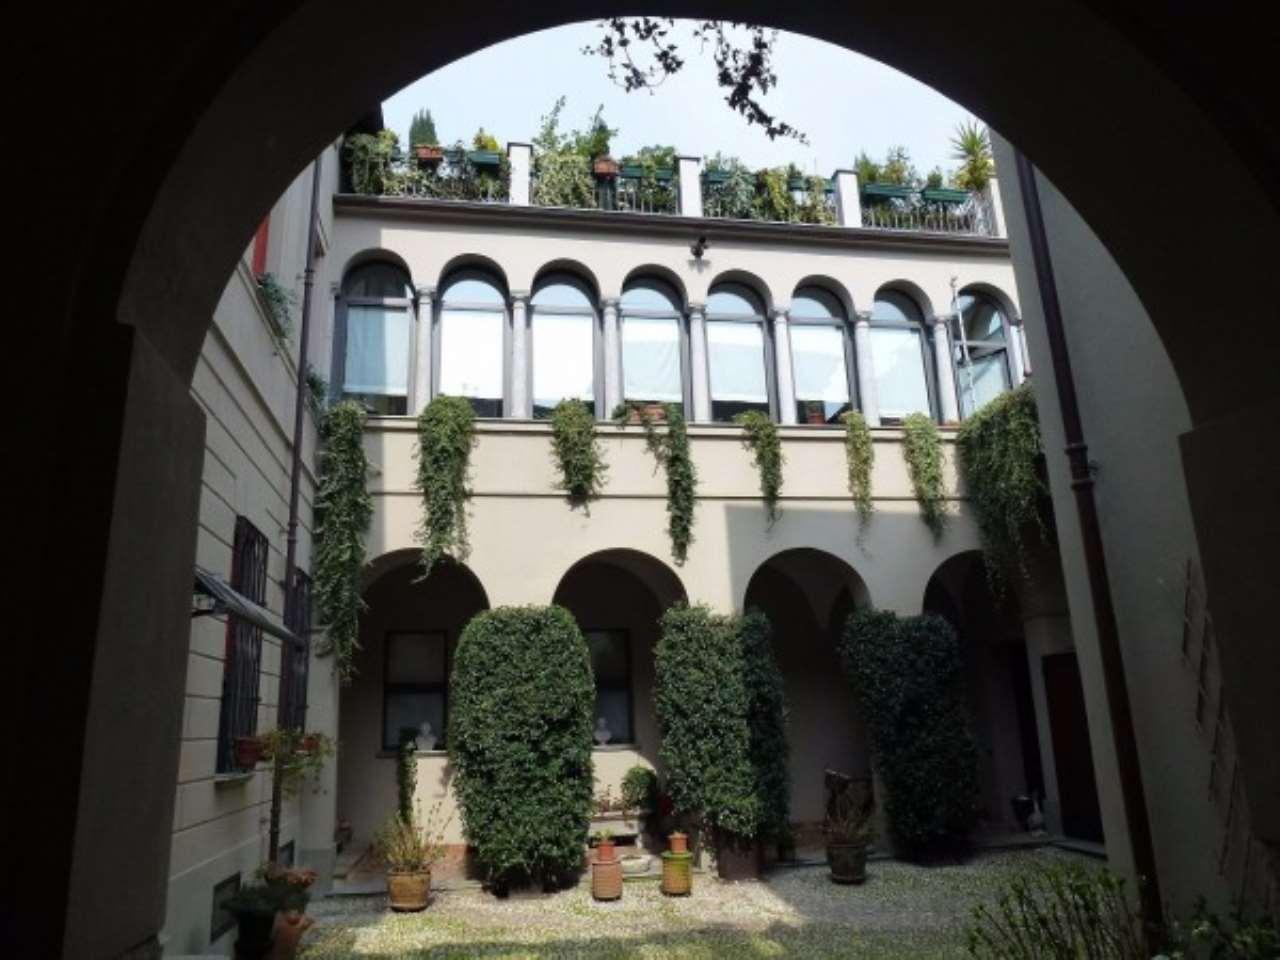 Mansarda Via Camillo Leone